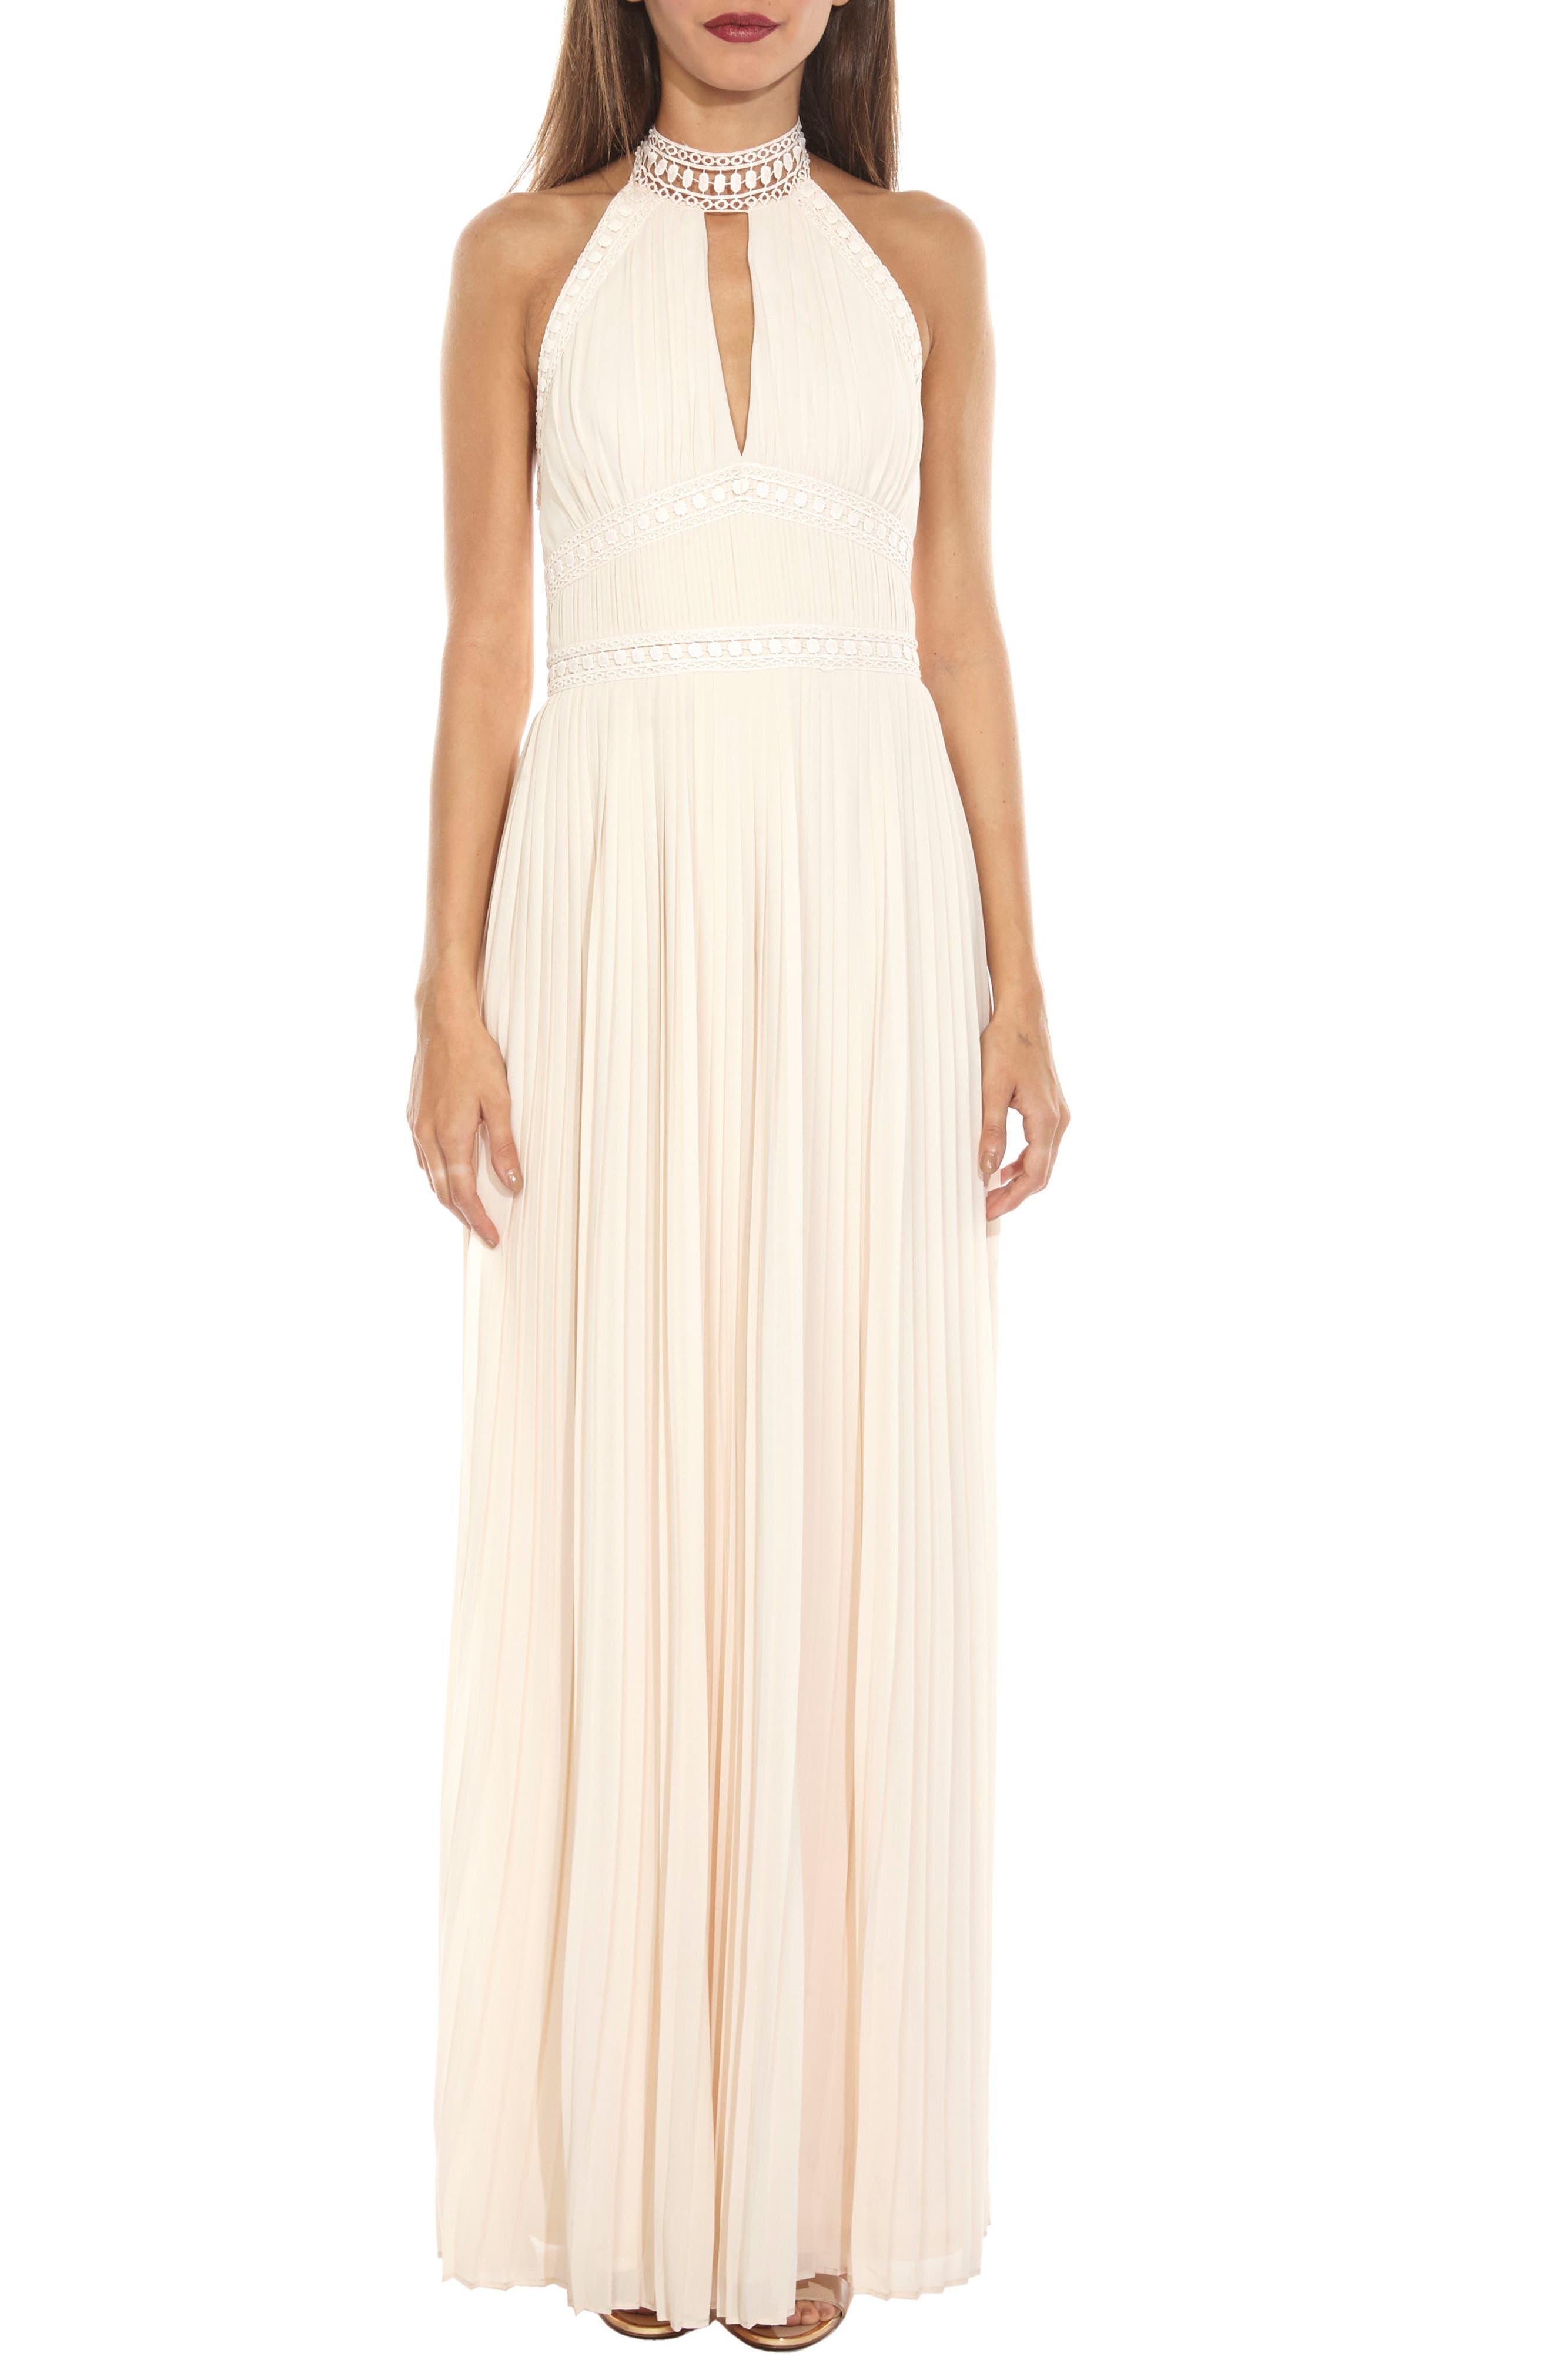 Main Image - TFNC Corinne Lace Trim Halter Maxi Dress